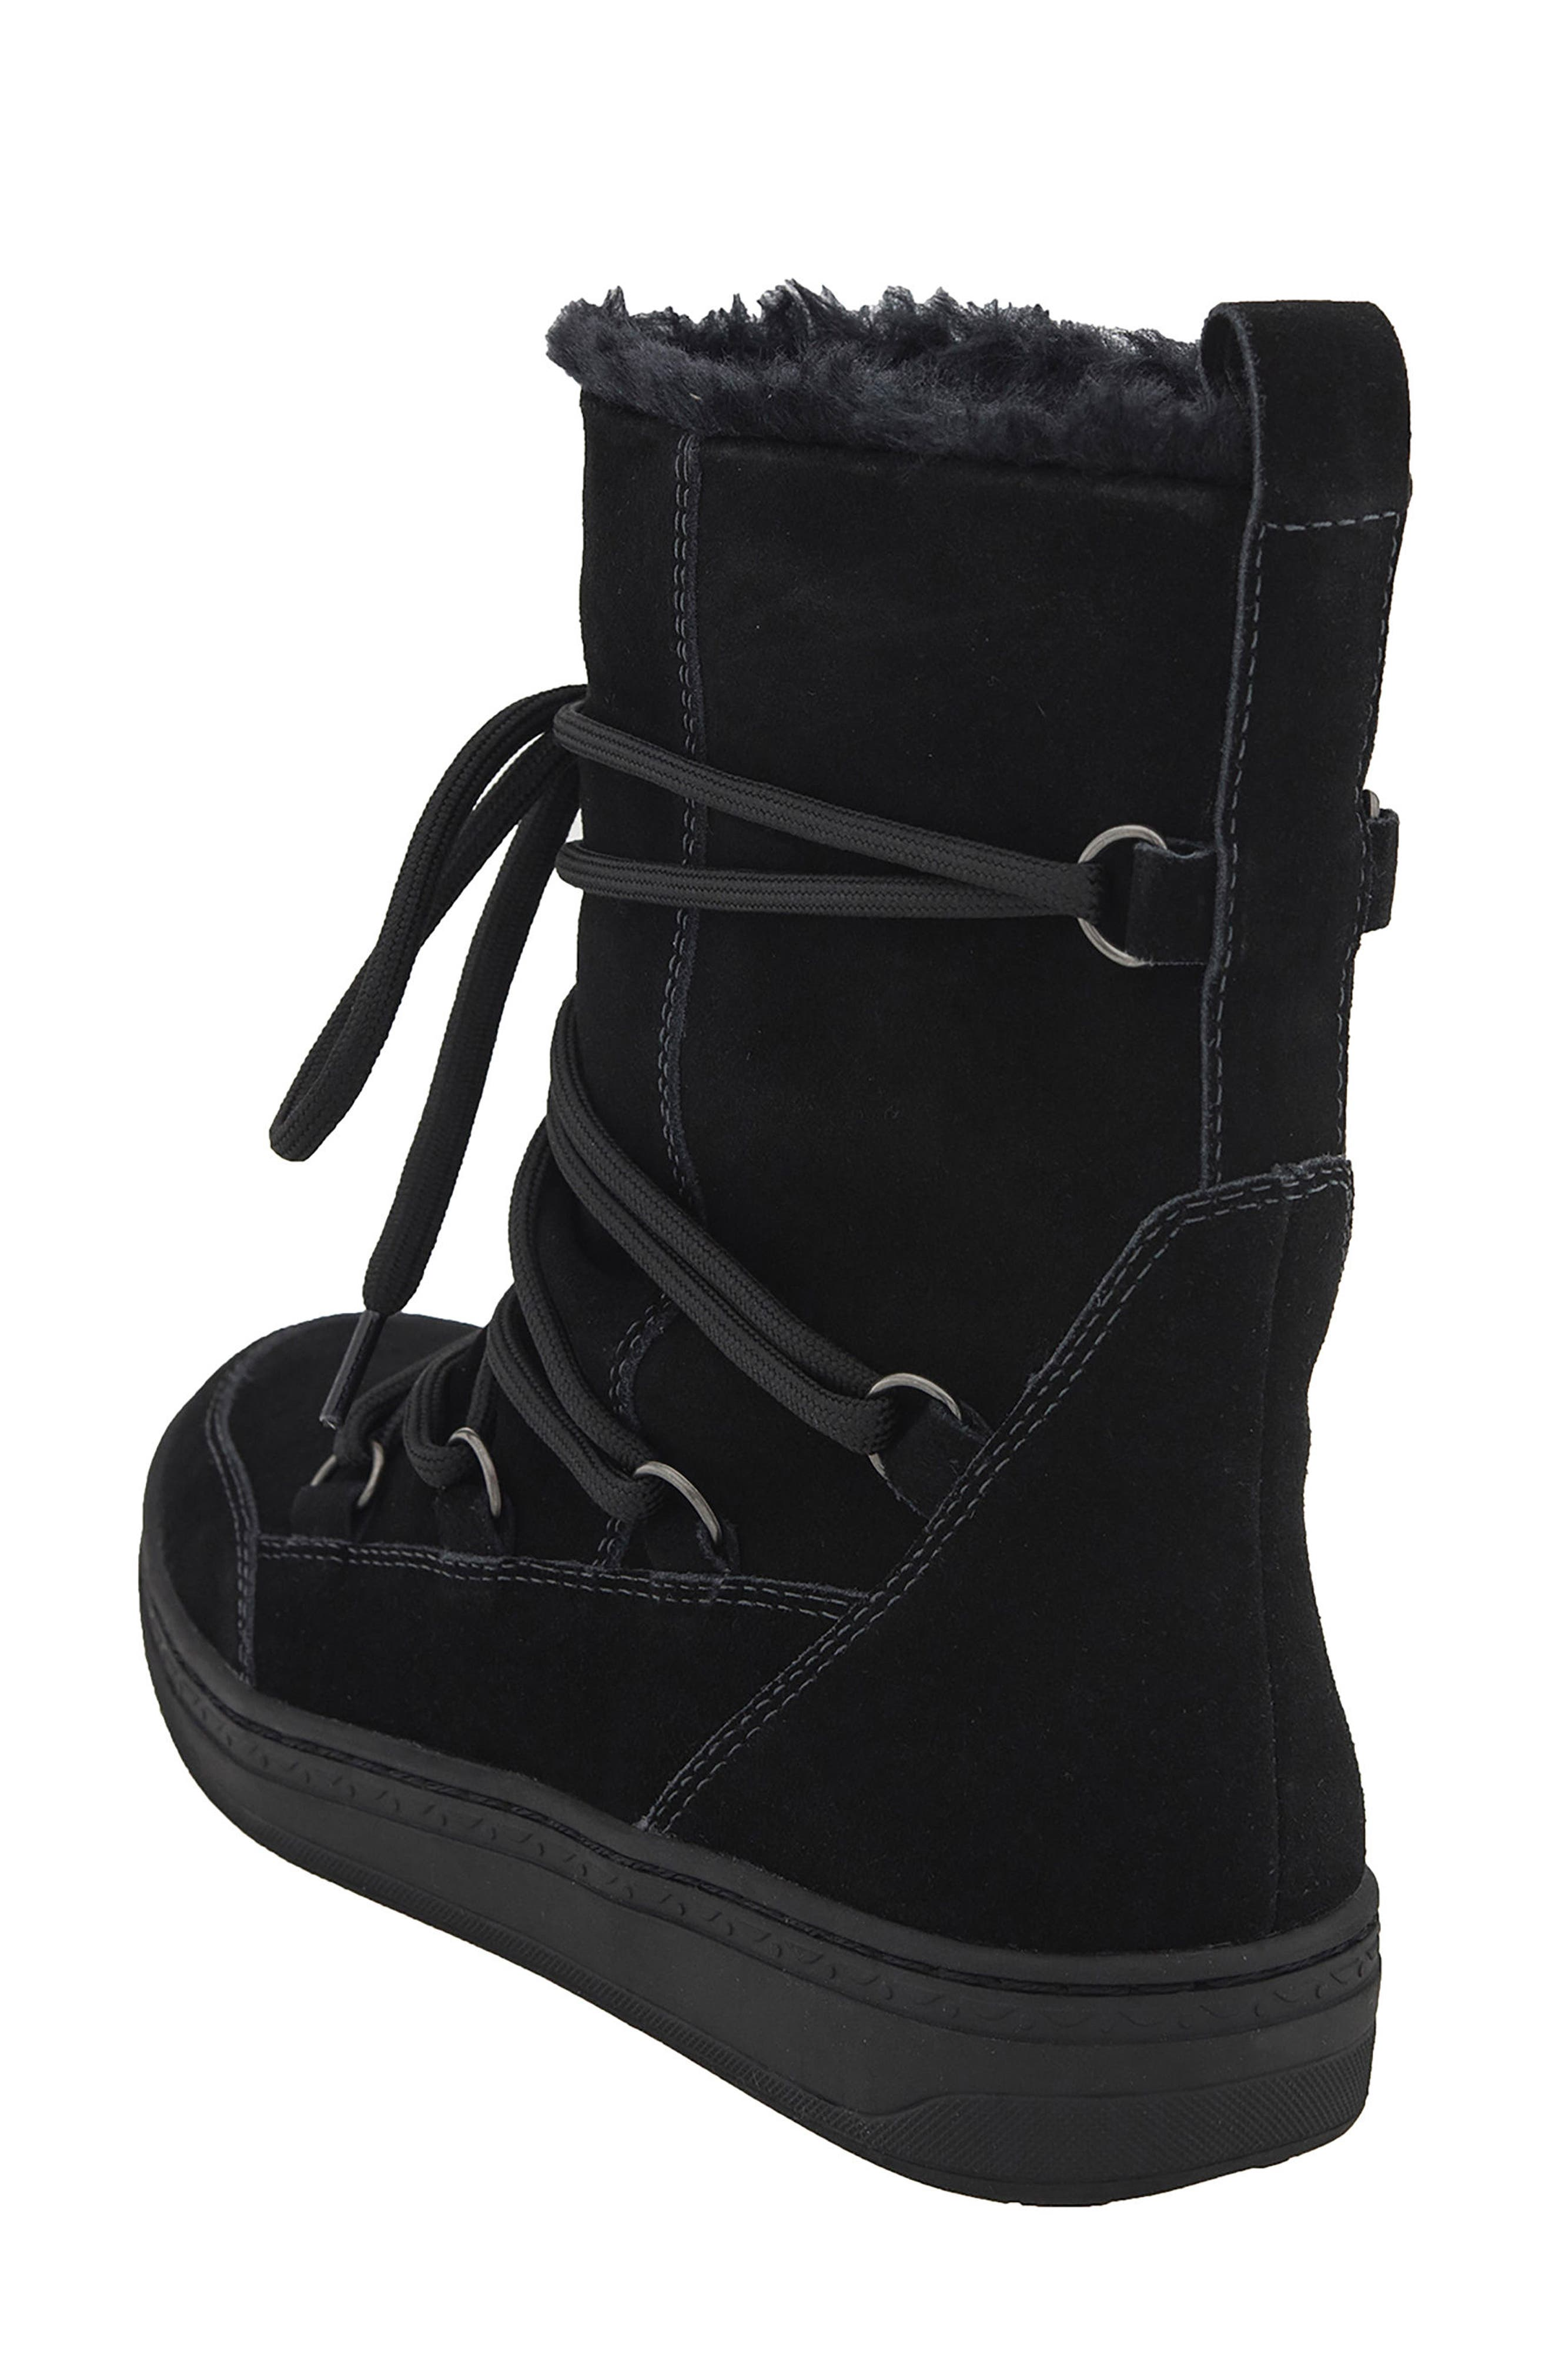 Zodiac Water Resistant Boot,                             Alternate thumbnail 2, color,                             Black Suede